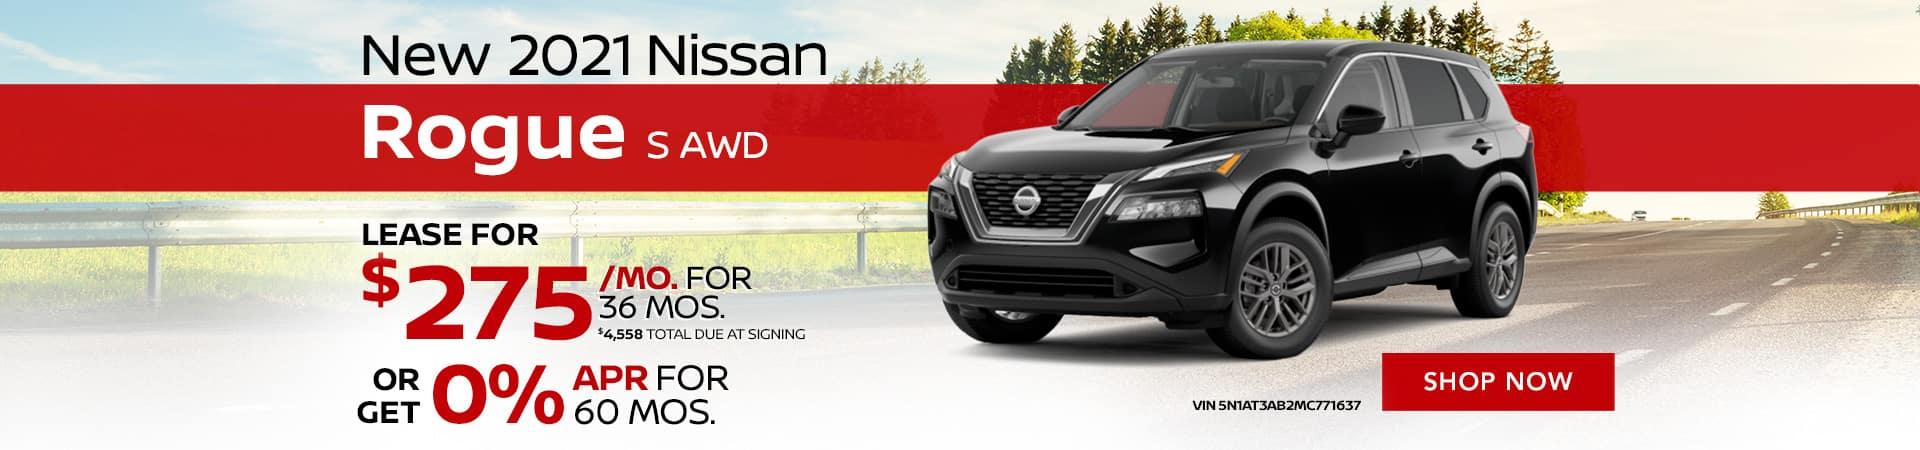 JRN_1920x450_New 2021 Nissan Rogue S AWD __06'21